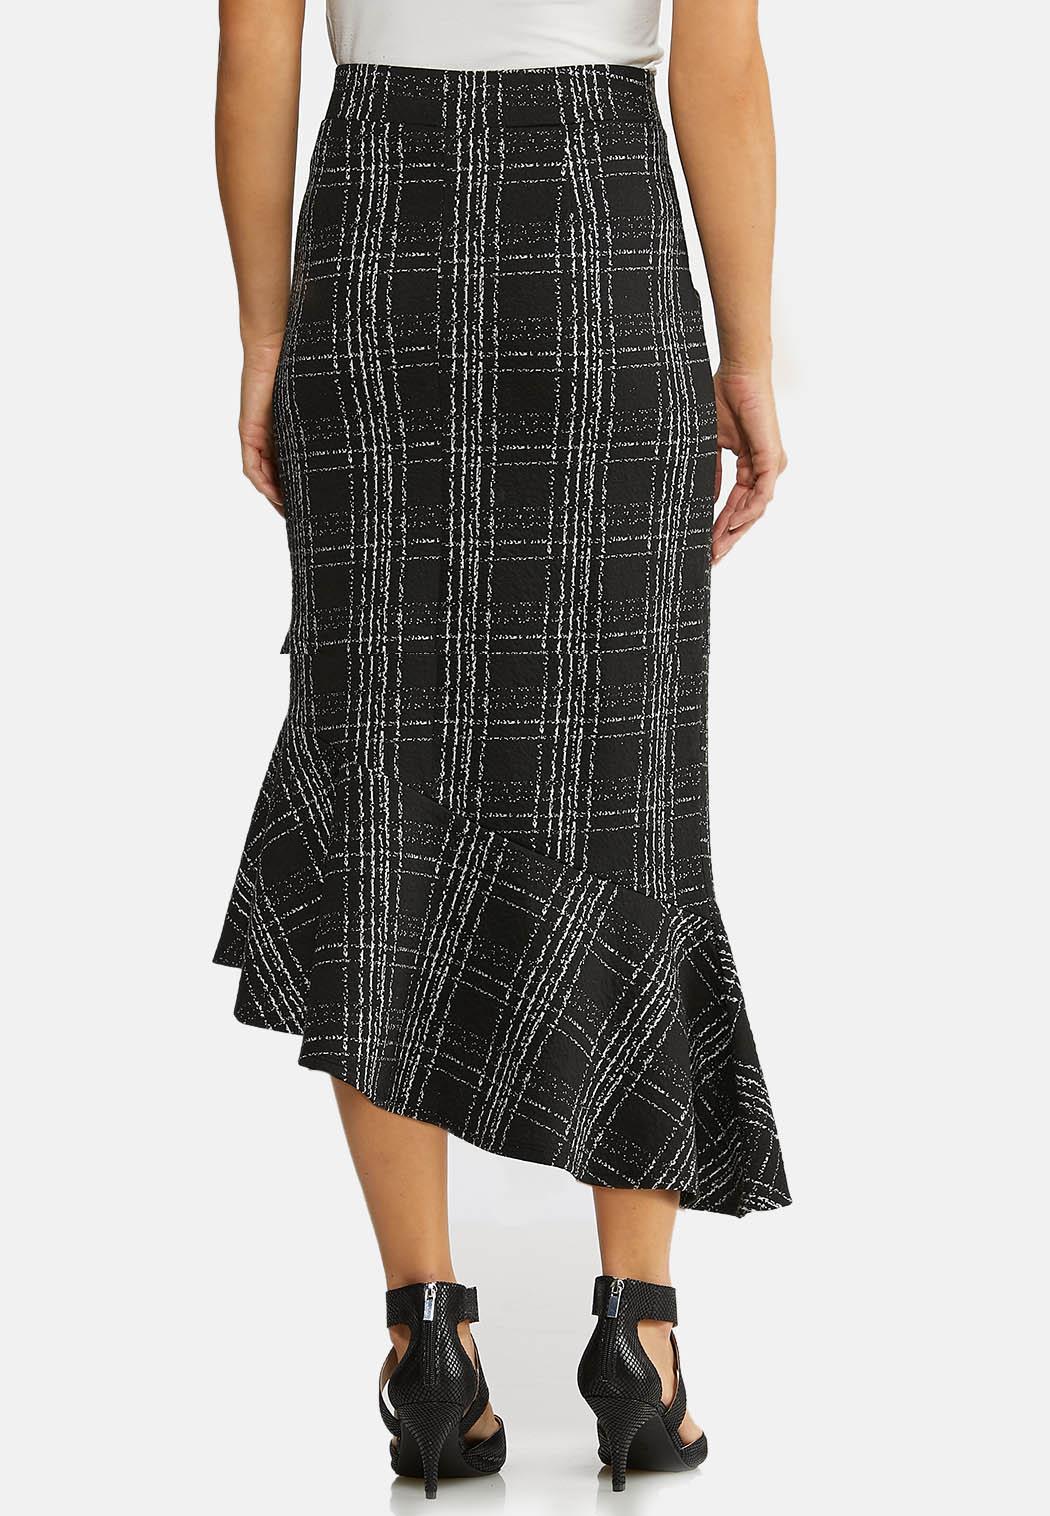 Plus Size Menswear Flounced Skirt (Item #43963043)